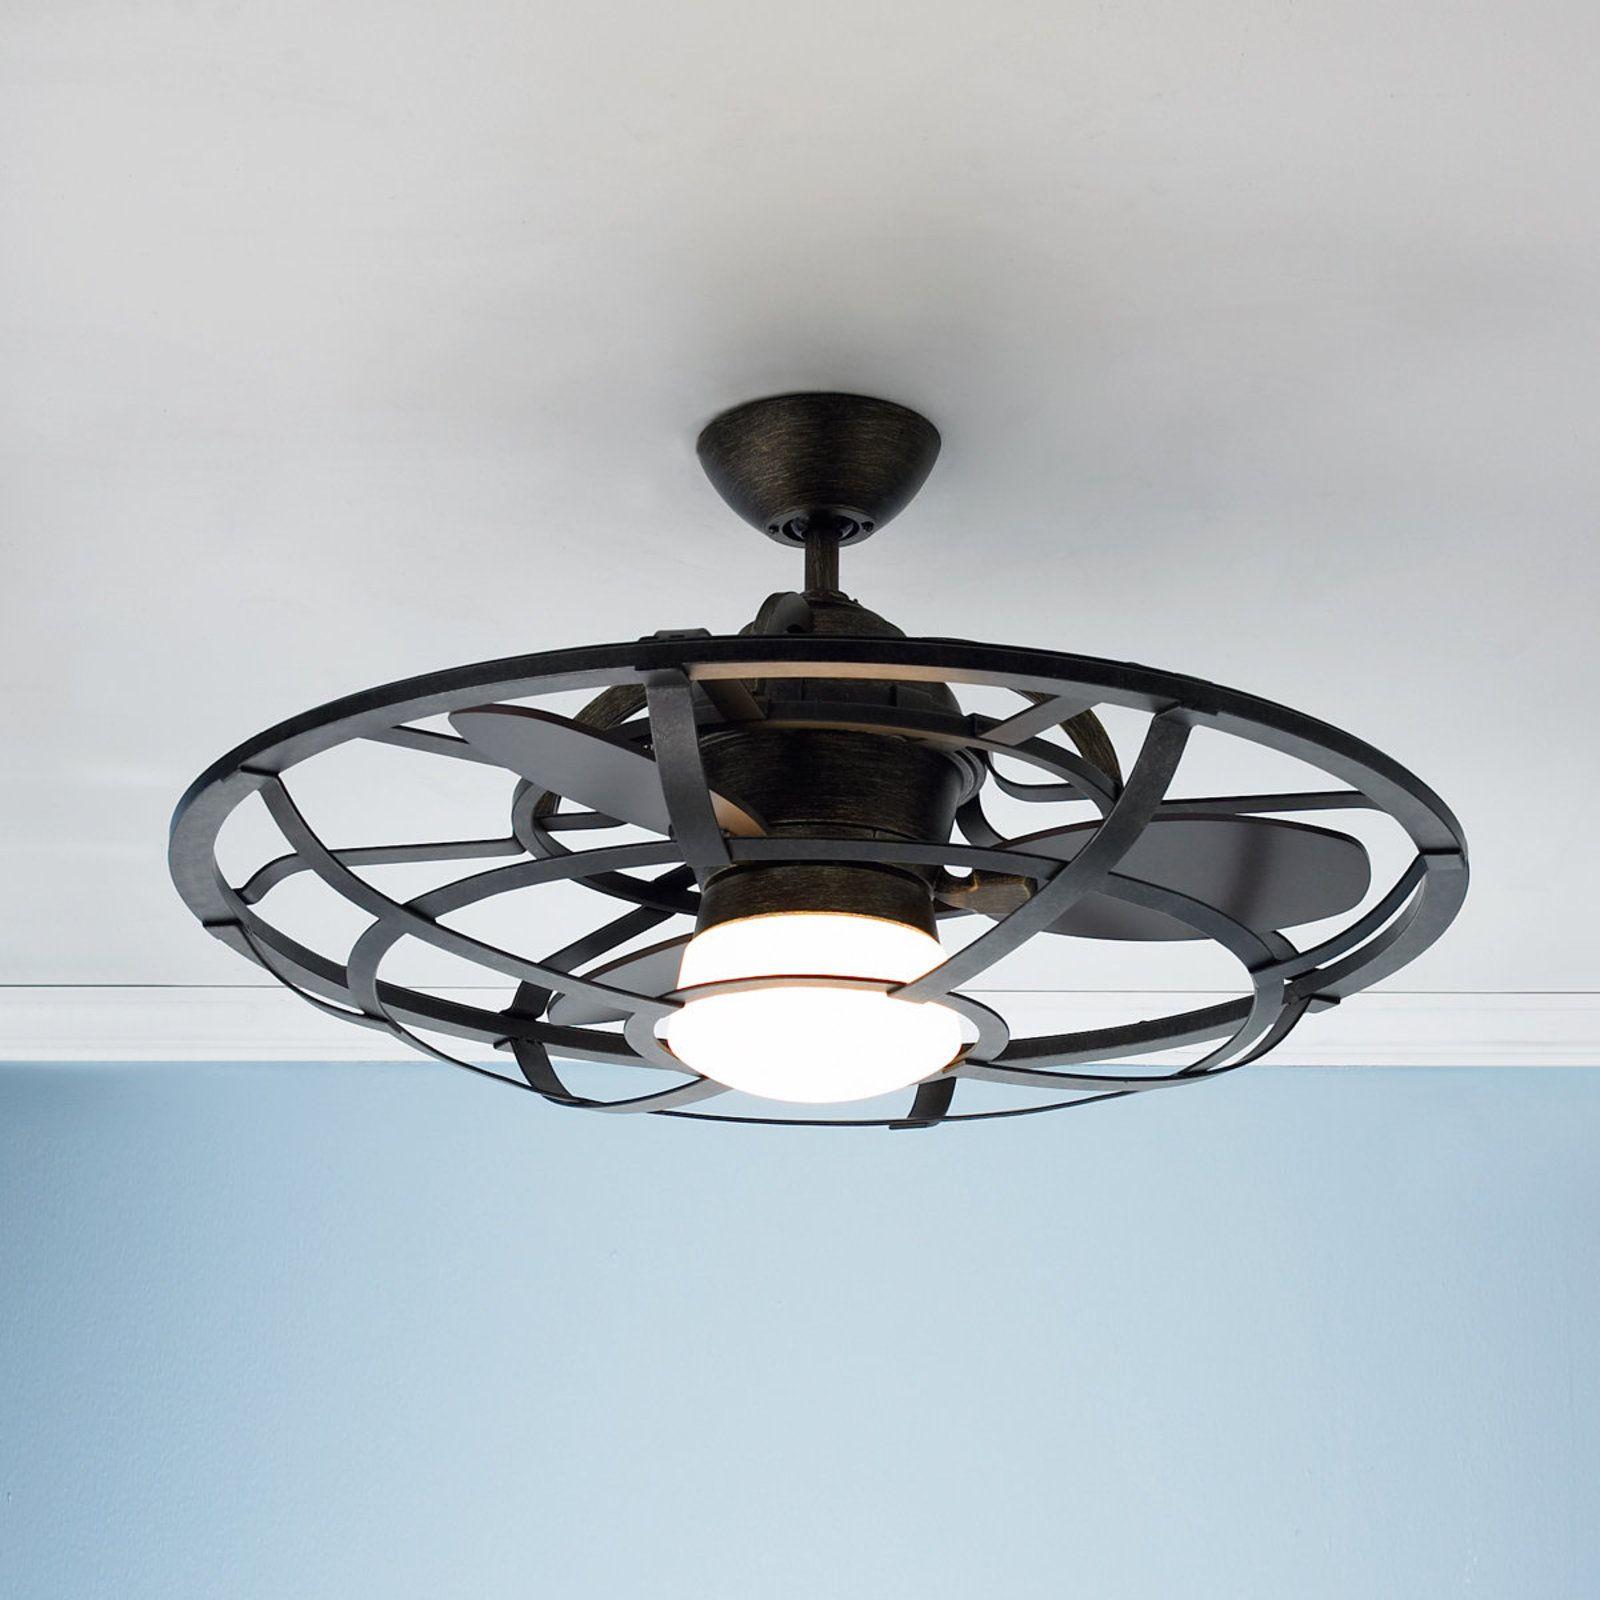 Industrial Cage Ceiling Fan